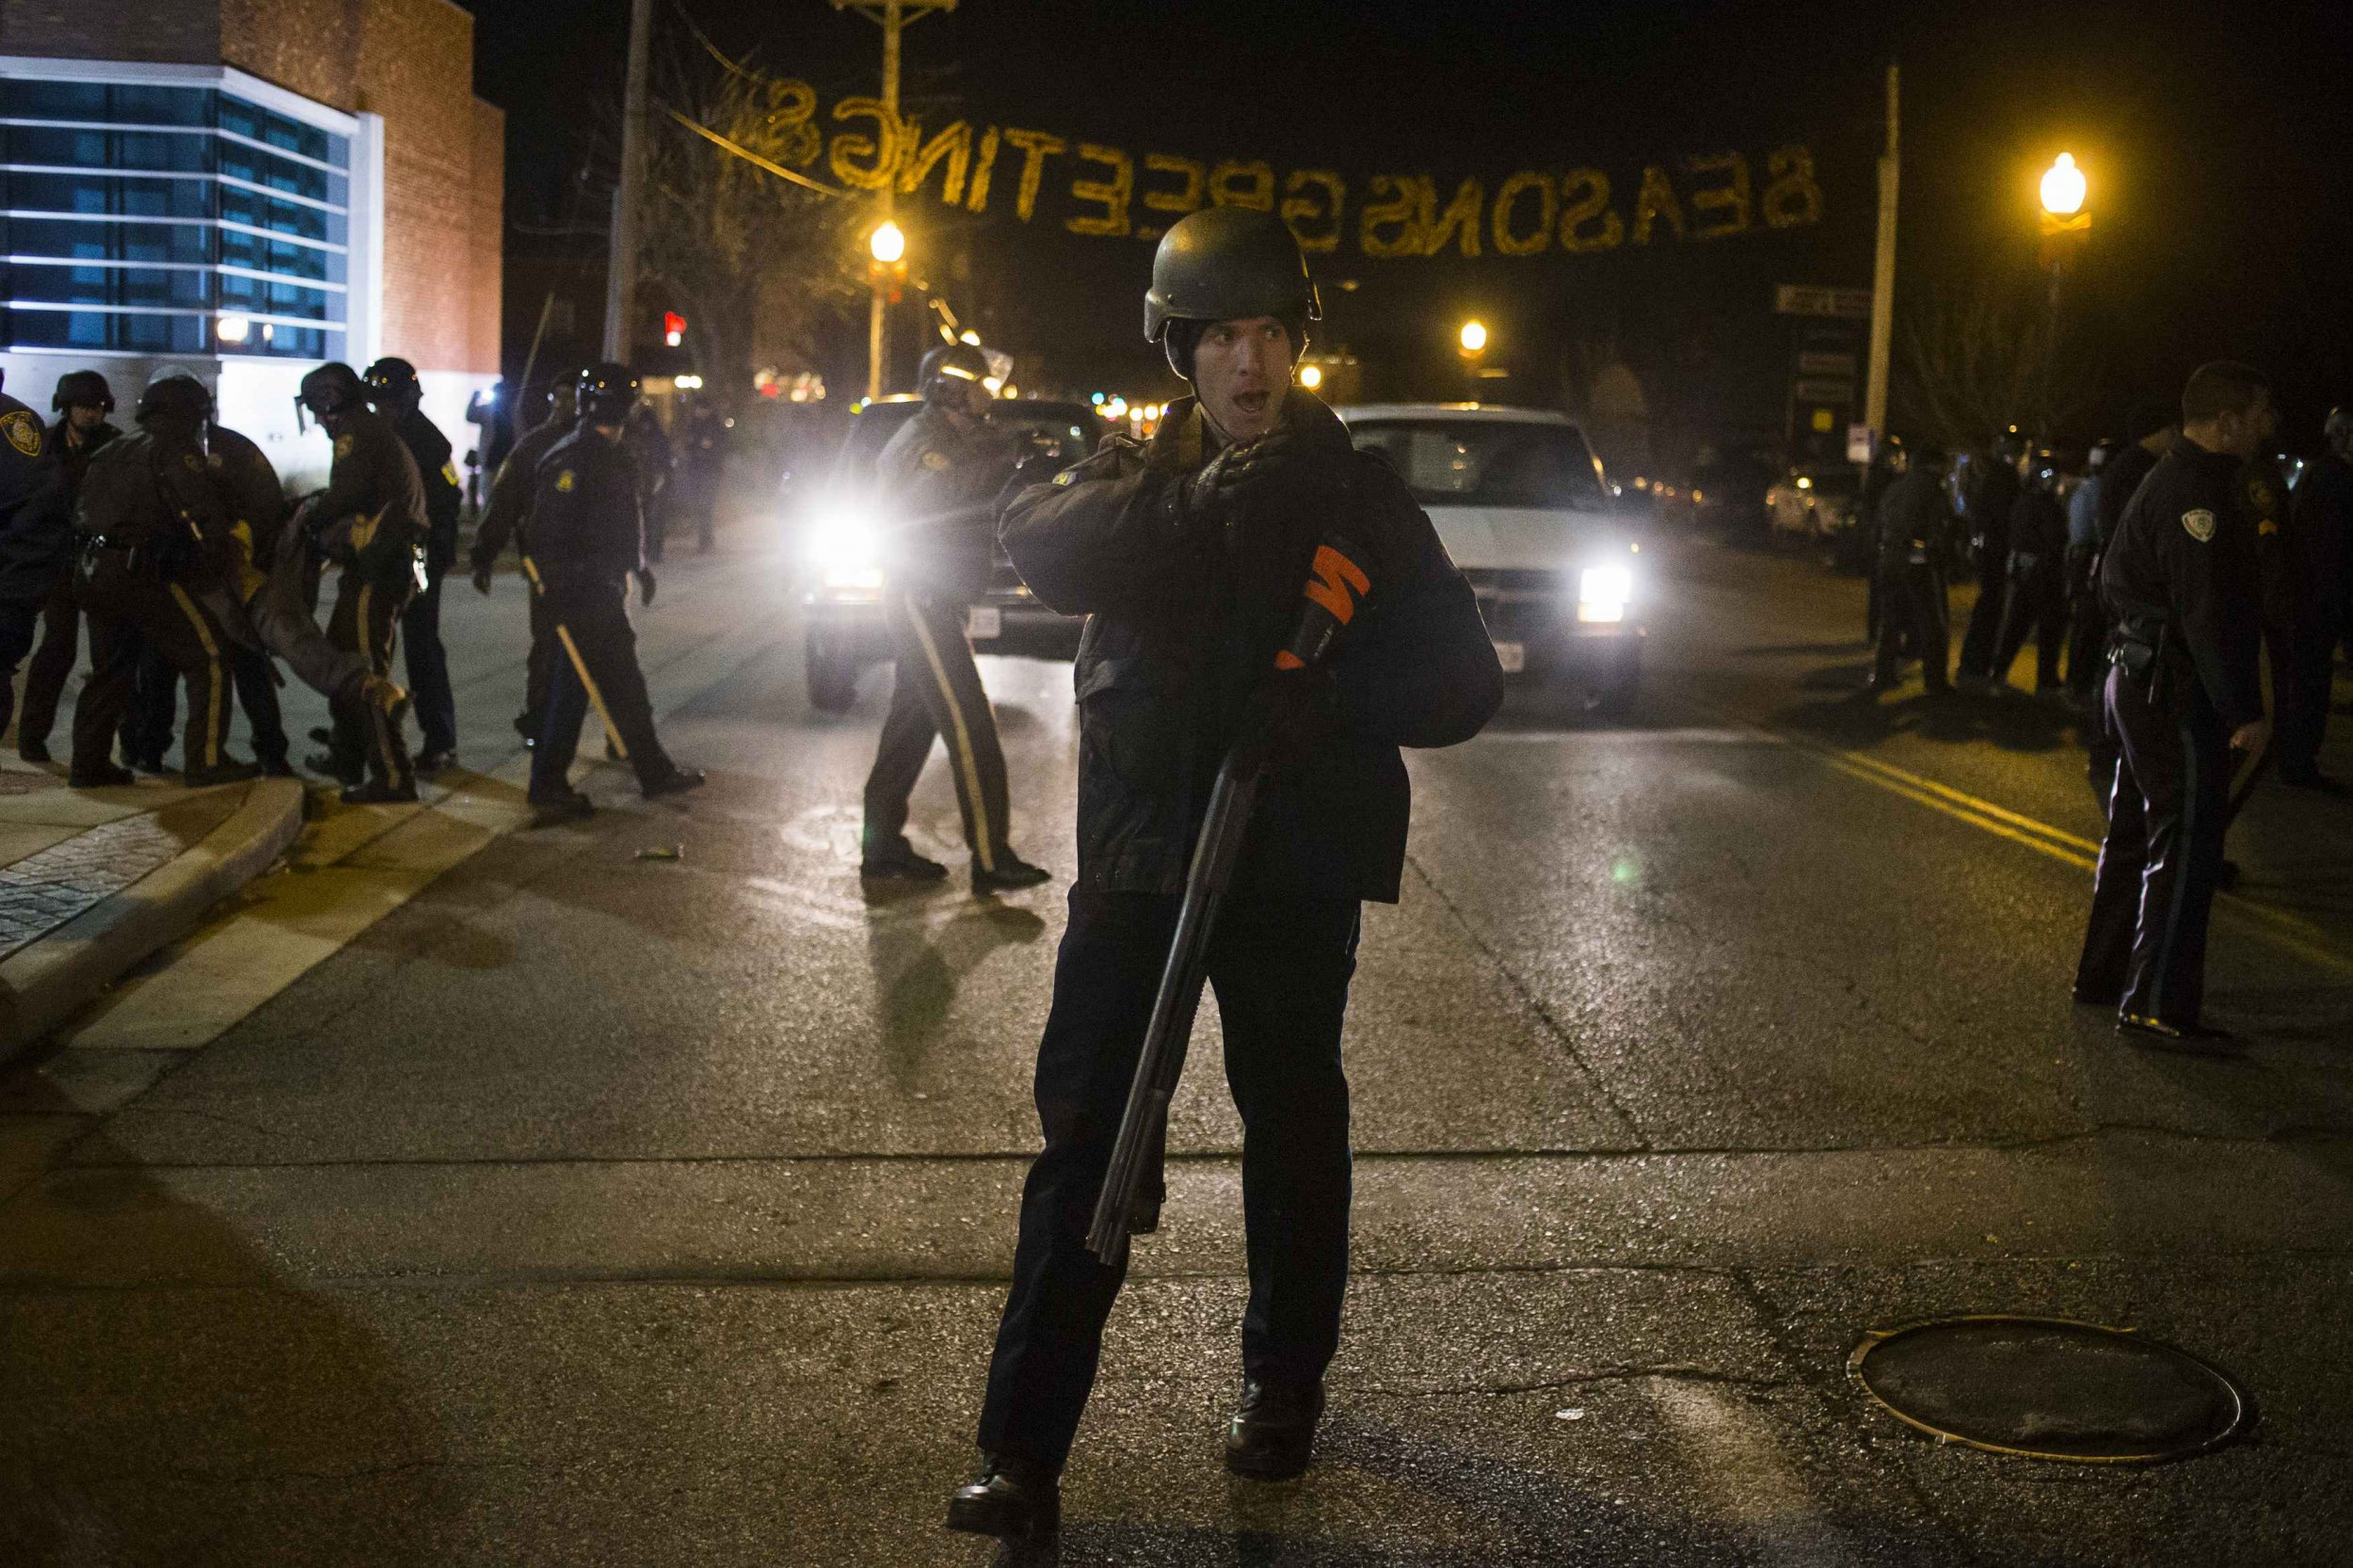 11-22-Ferguson protest